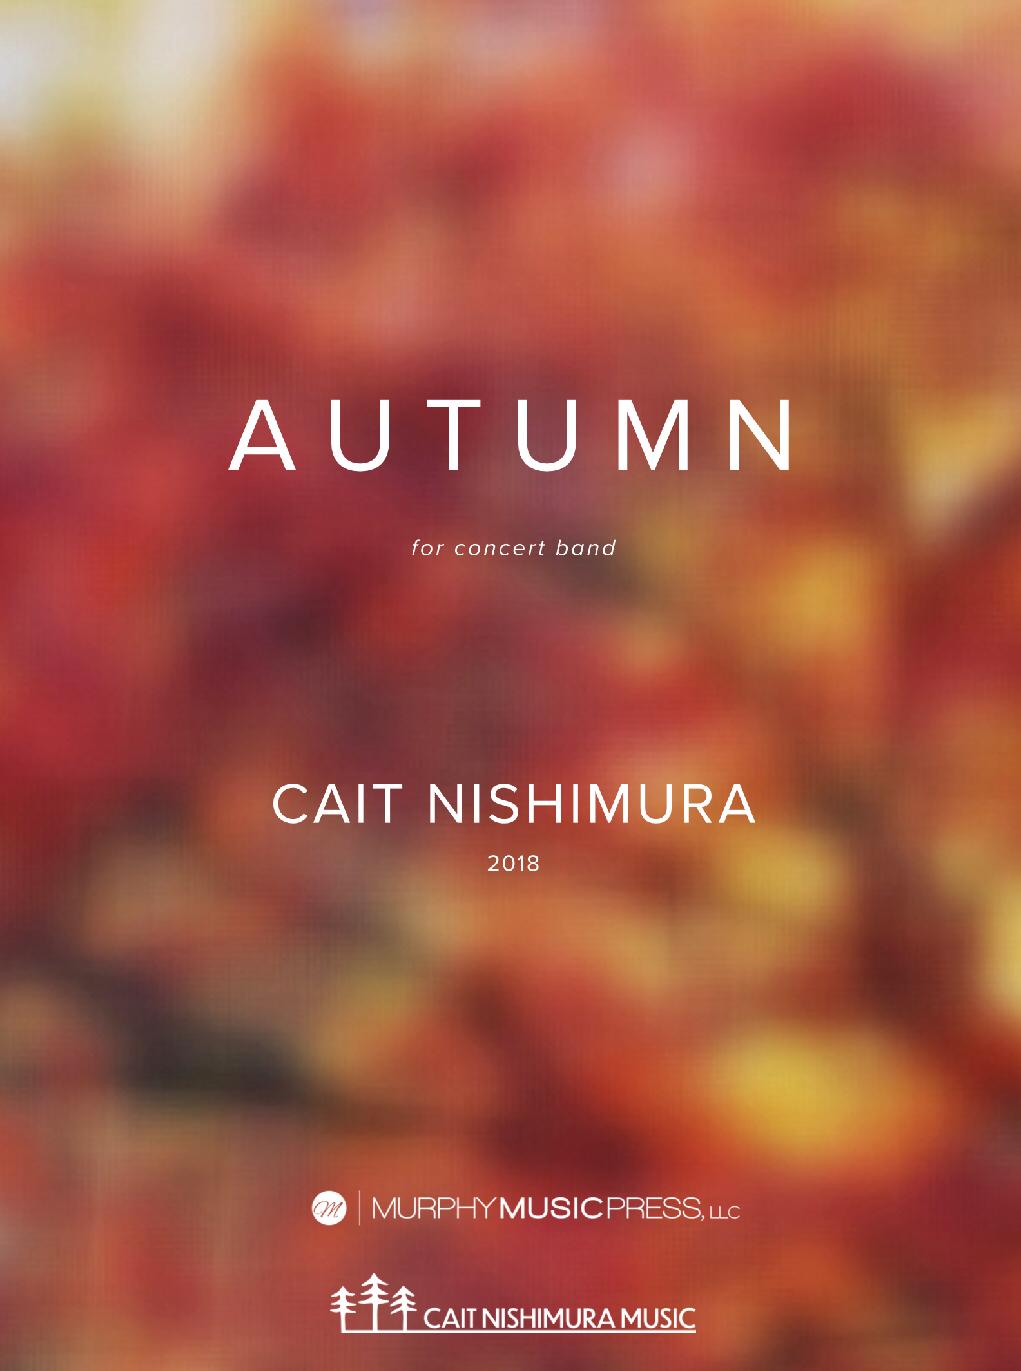 Autumn by Cait Nishimura